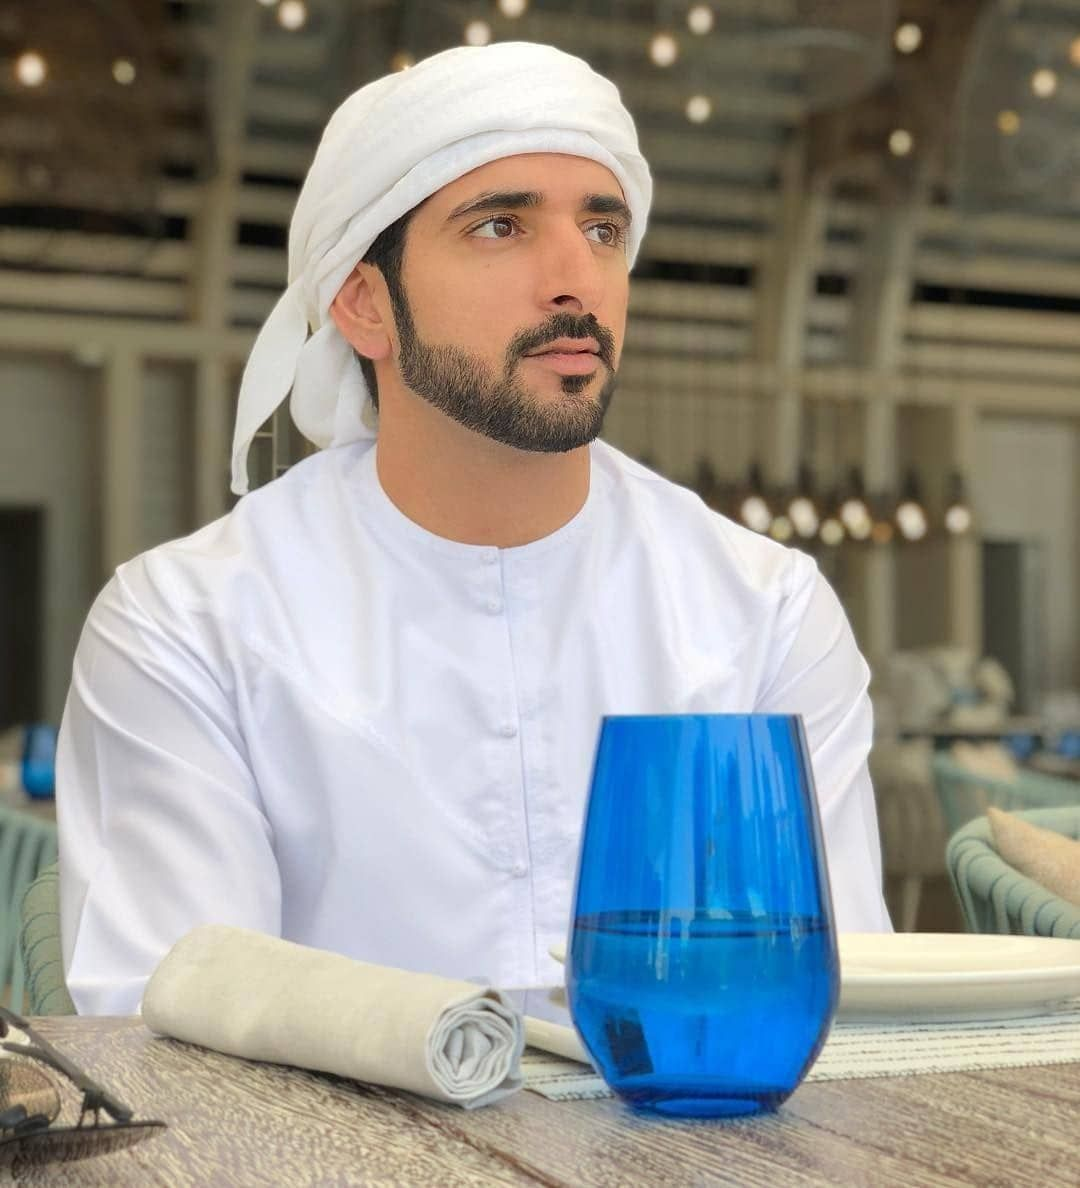 Sheikh Hamdan Bin Mohammed On Instagram Faz3 Highness Crown Prince Of Dubai Sheikh Hamdan Bin Mohammed Handsome Arab Men Dubai World Handsome Man